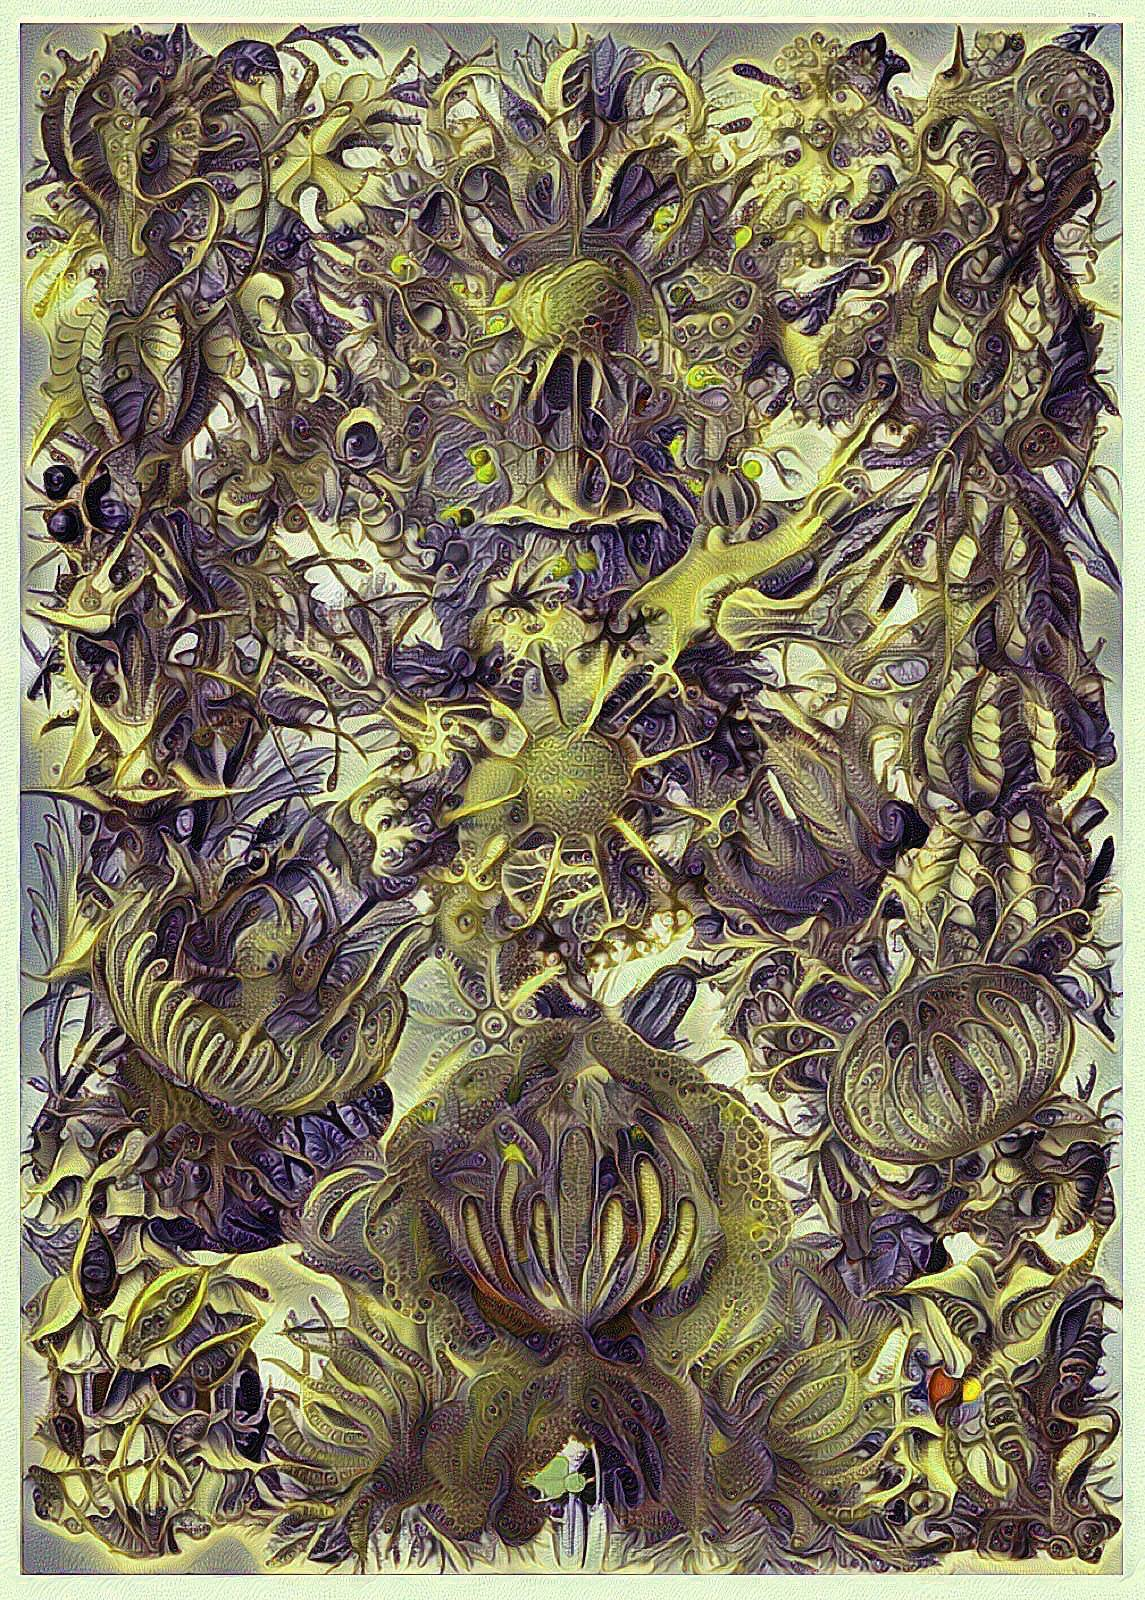 Haeckel Variation 17